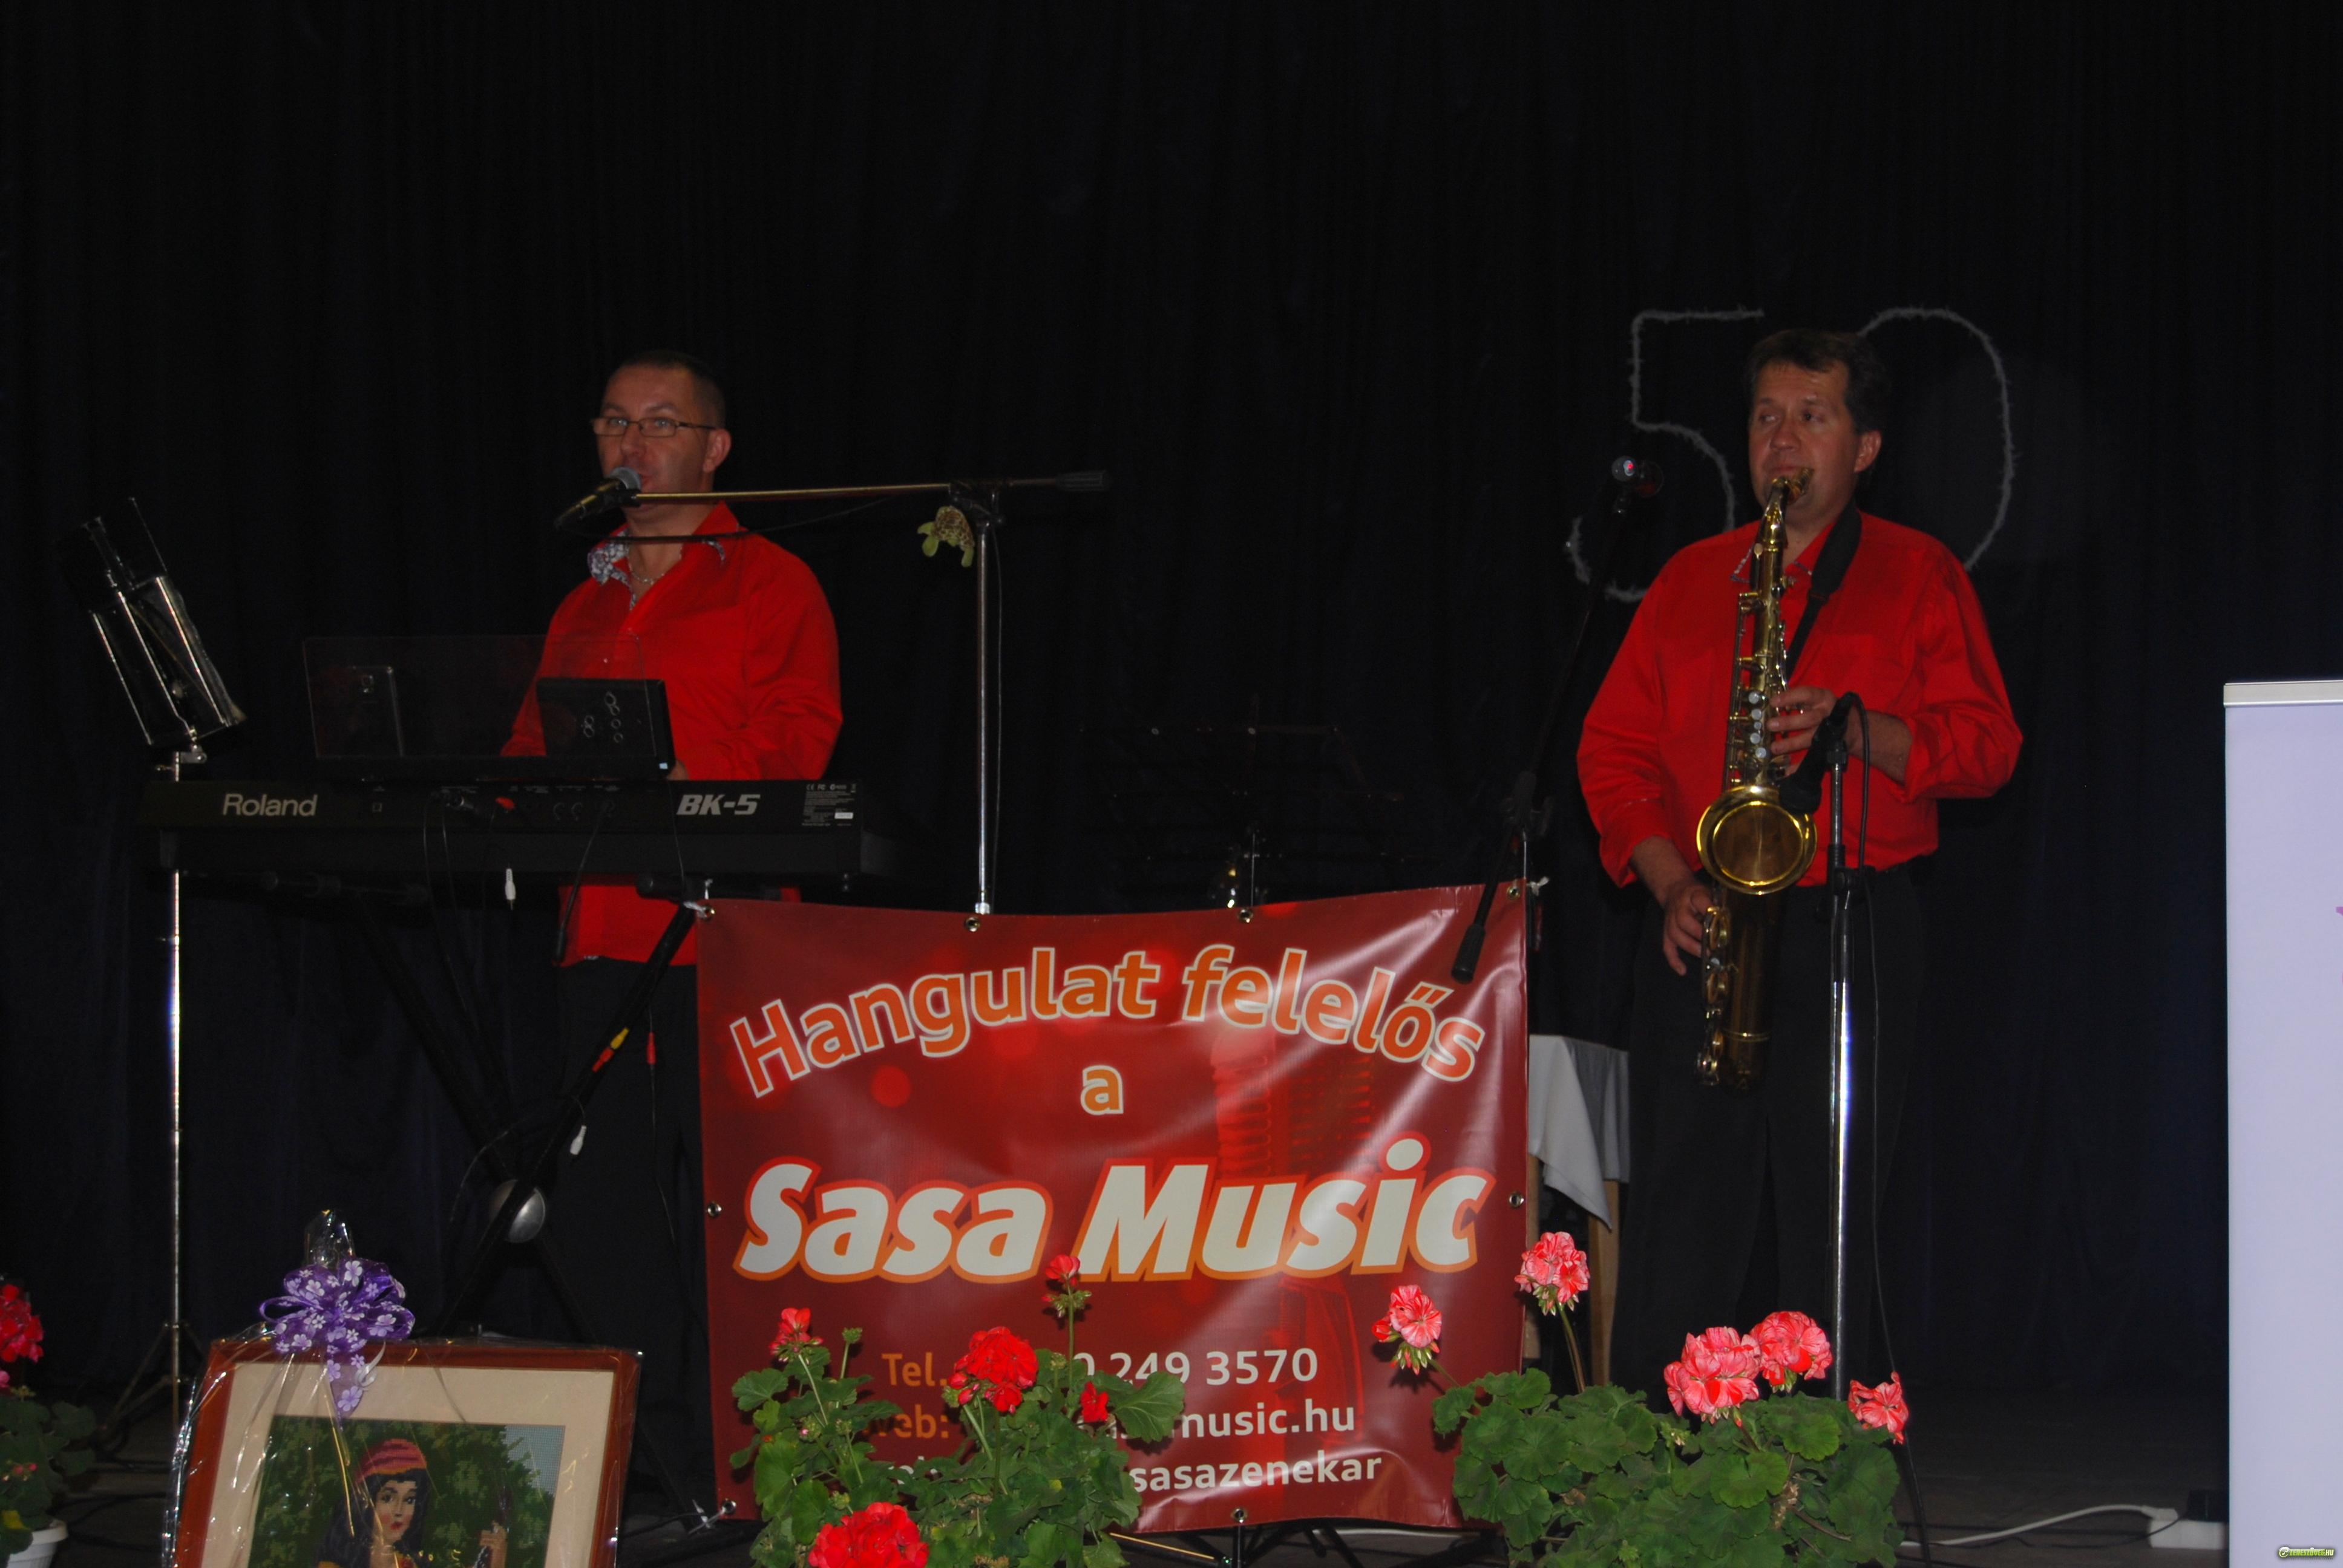 Sasamusic Zenekar